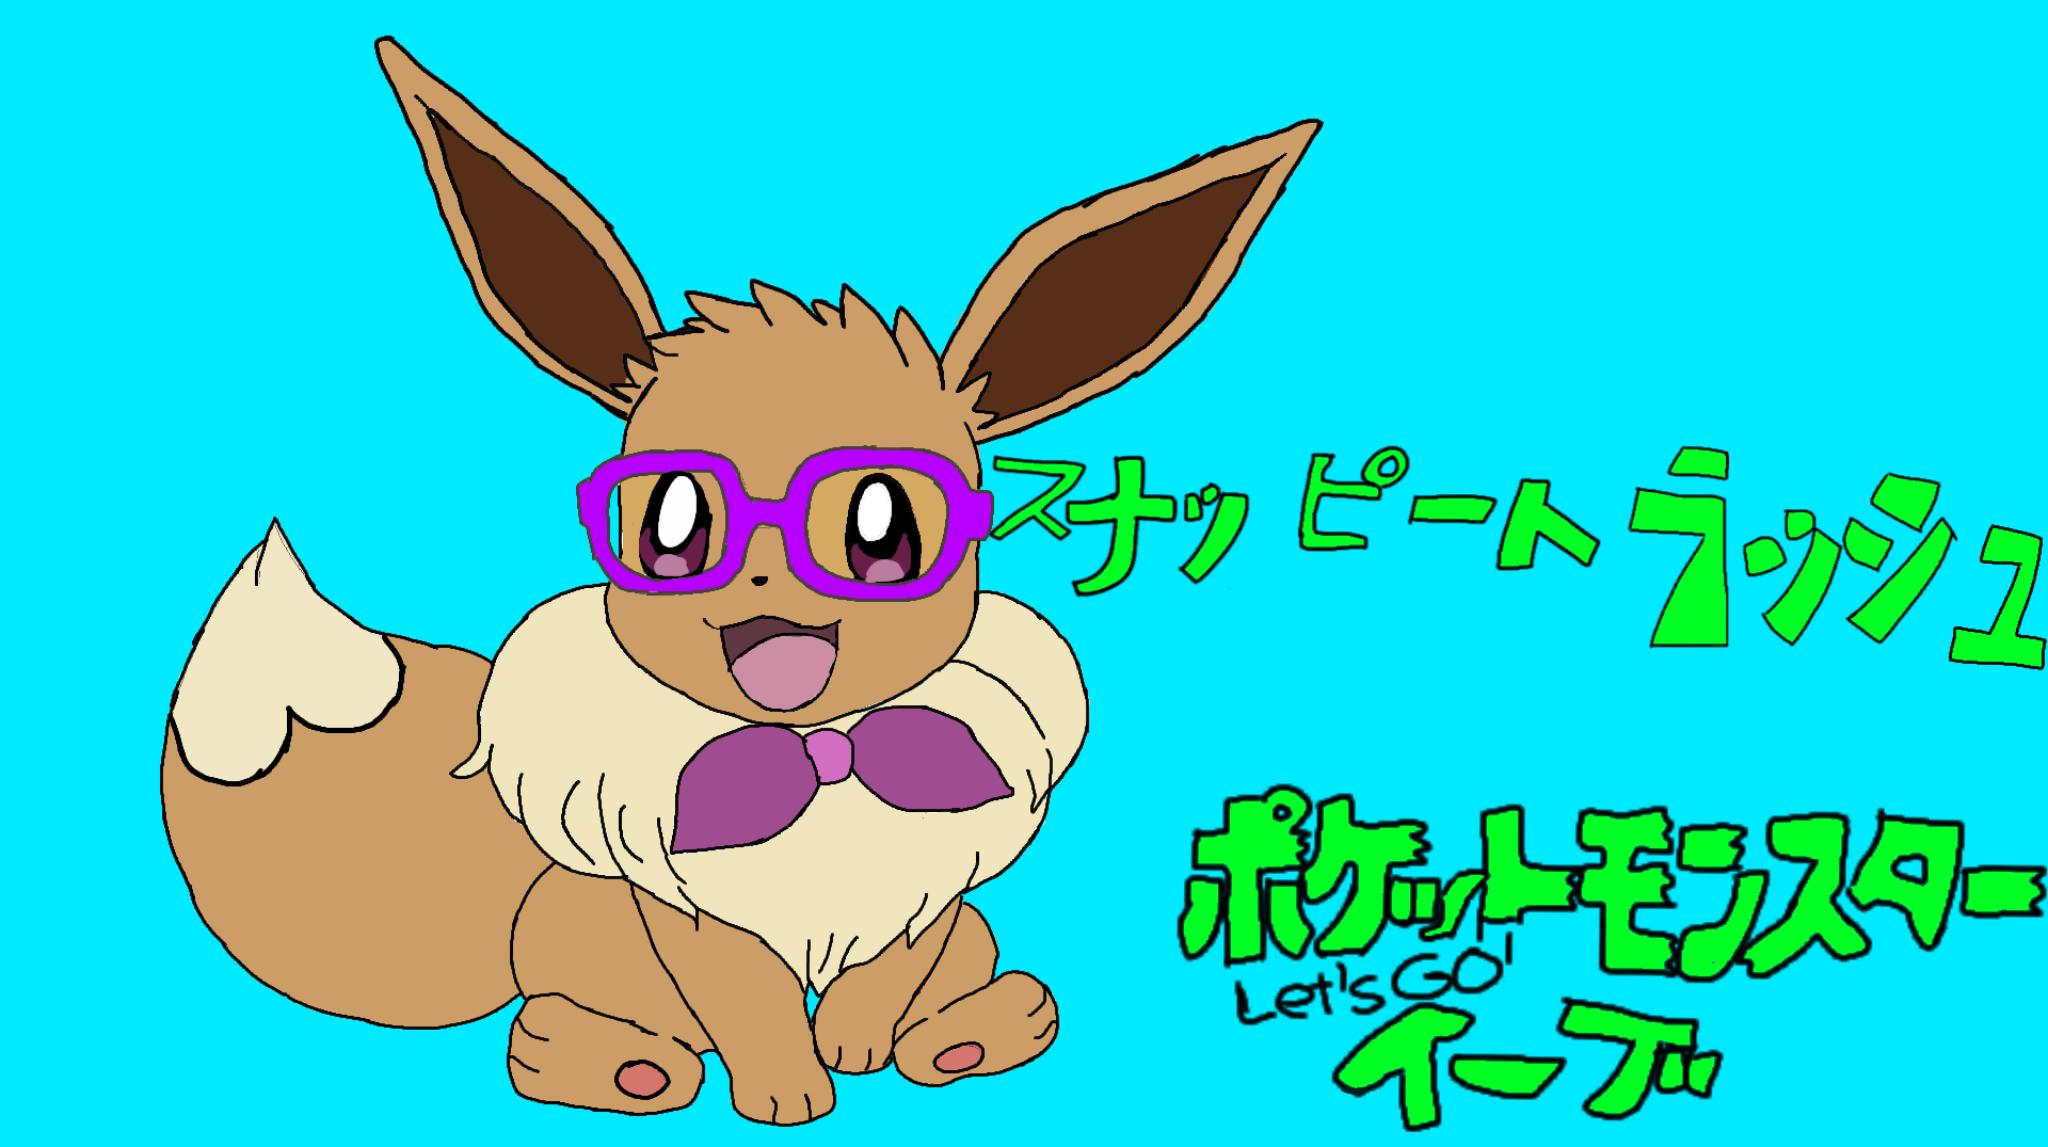 An pokemon eevee wearing glasses